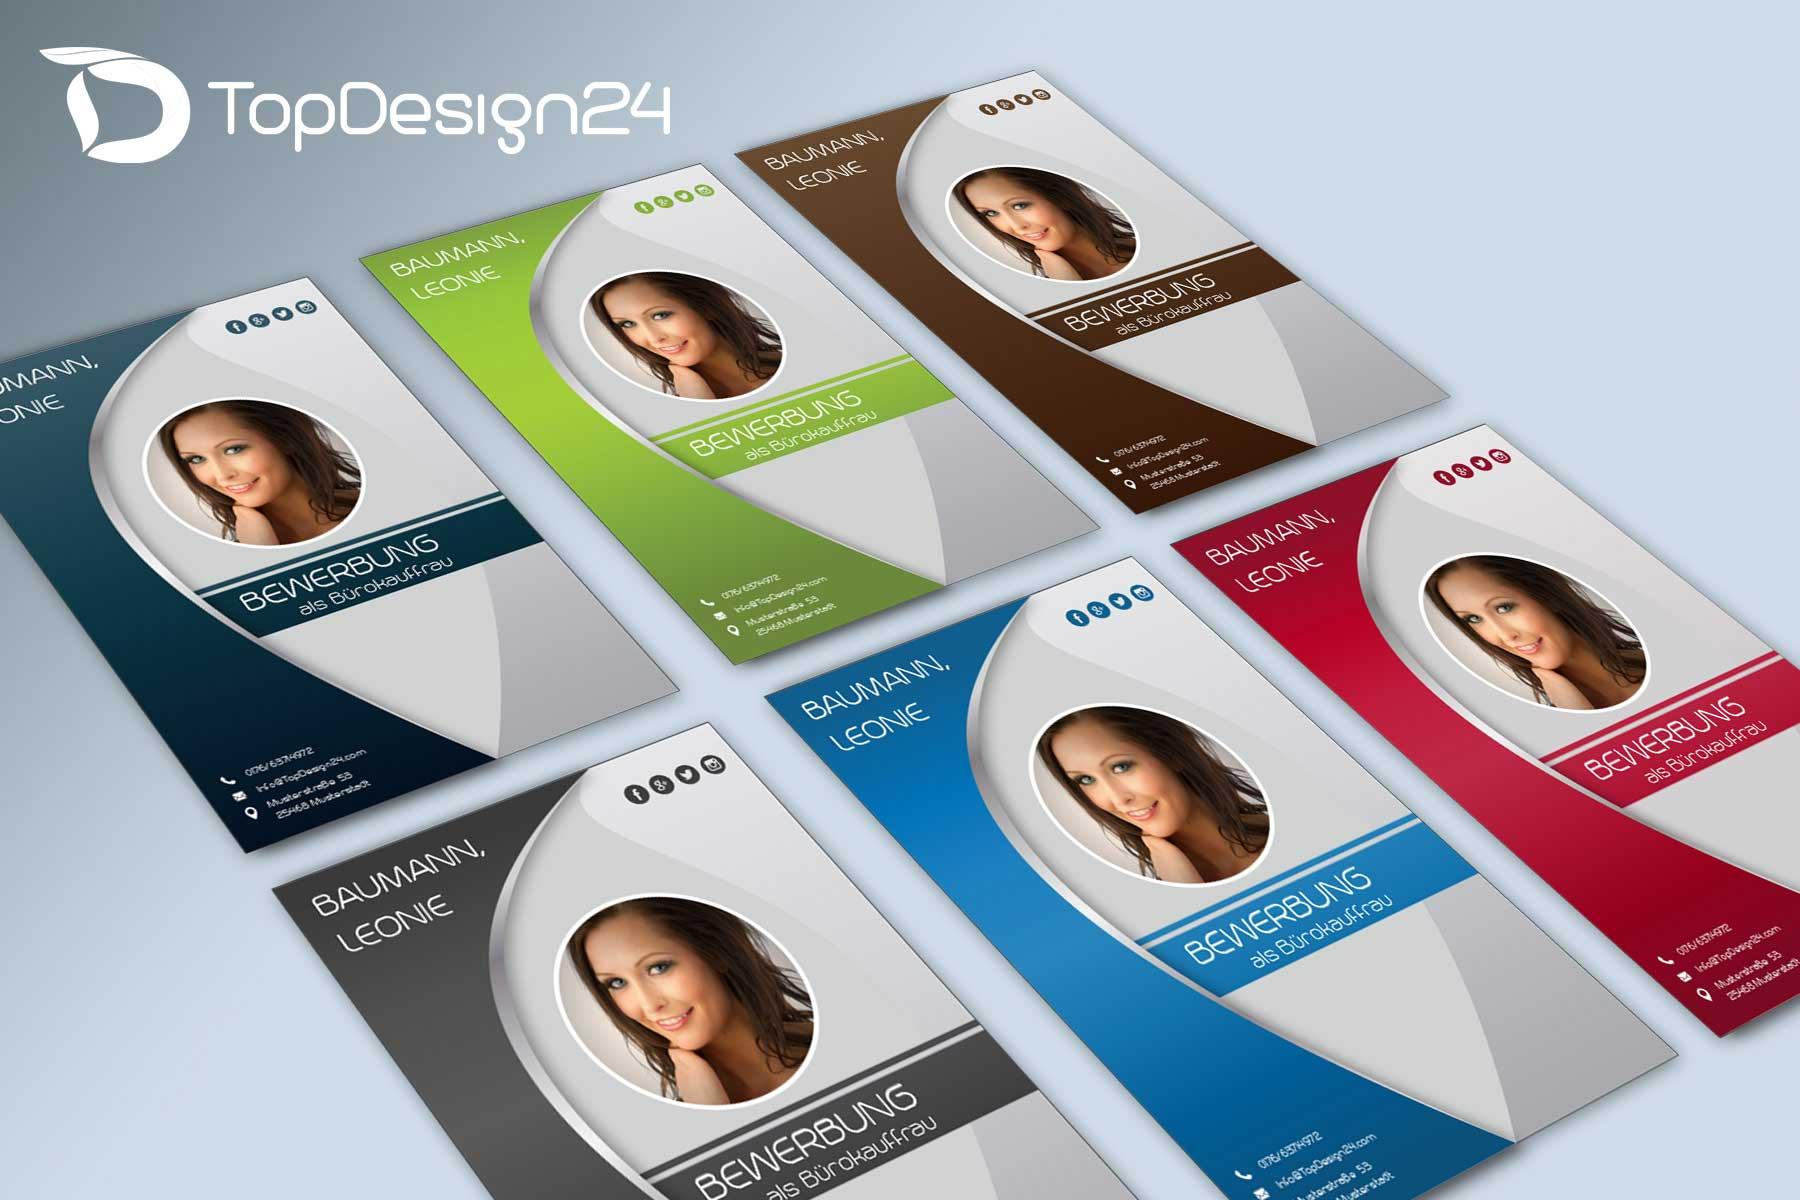 bewerbung deckblatt kreativ vorlagen topdesign24. Black Bedroom Furniture Sets. Home Design Ideas